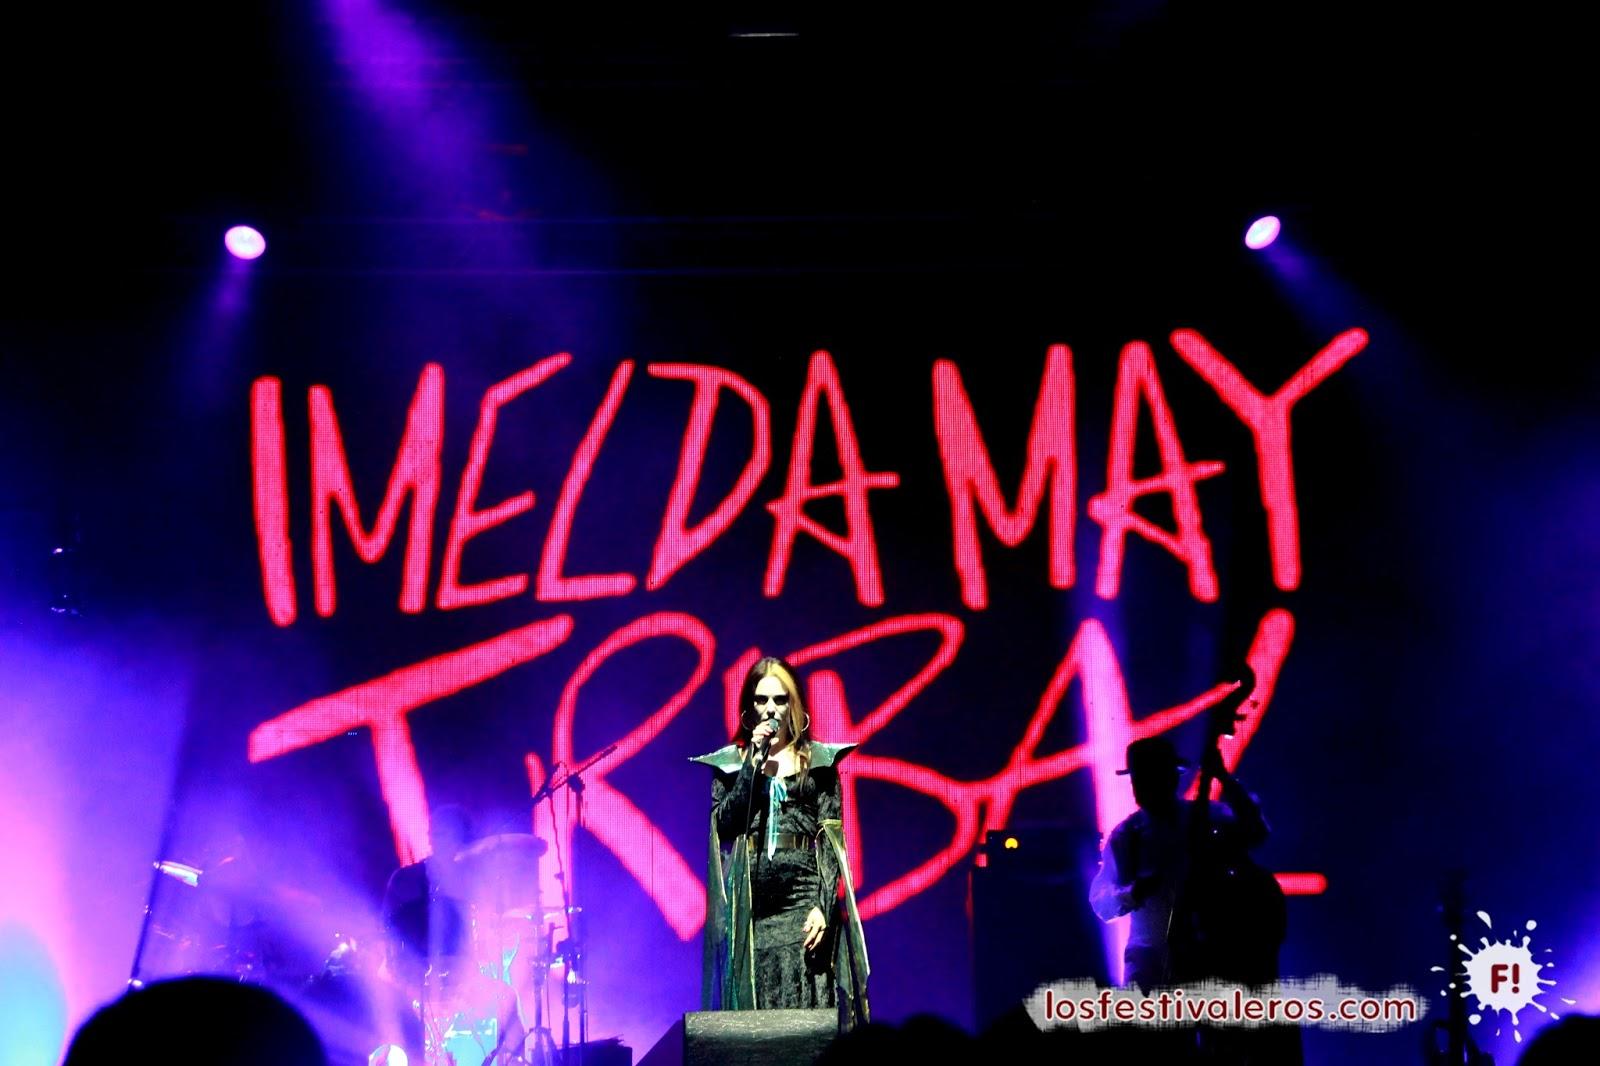 Imelda May, BIME, 2014, Halloween, Concierto, Festival